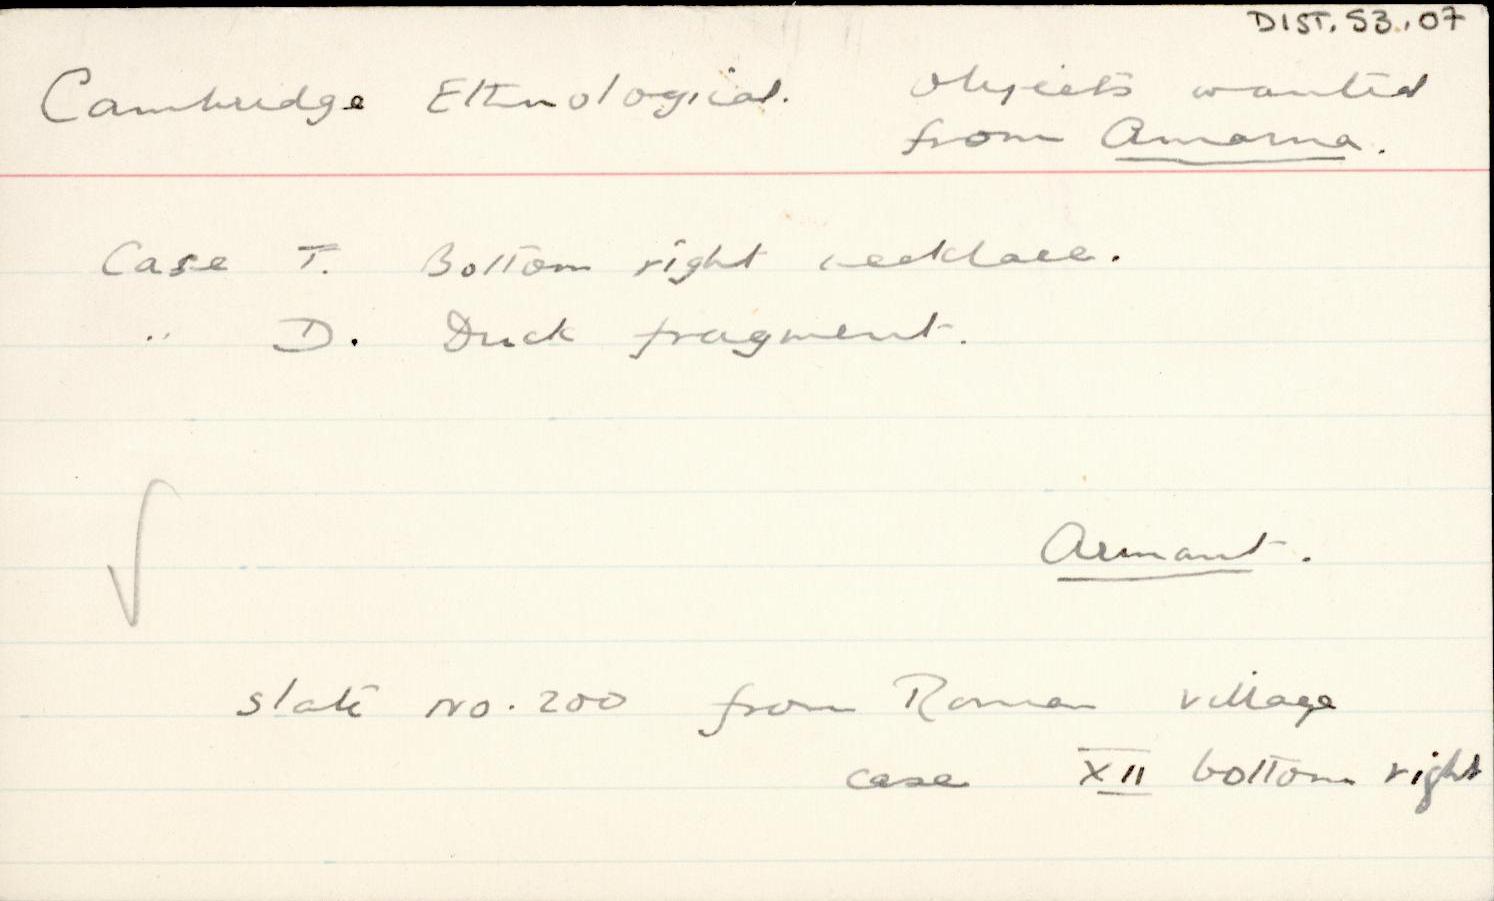 1930-32 Armant DIST.53.07